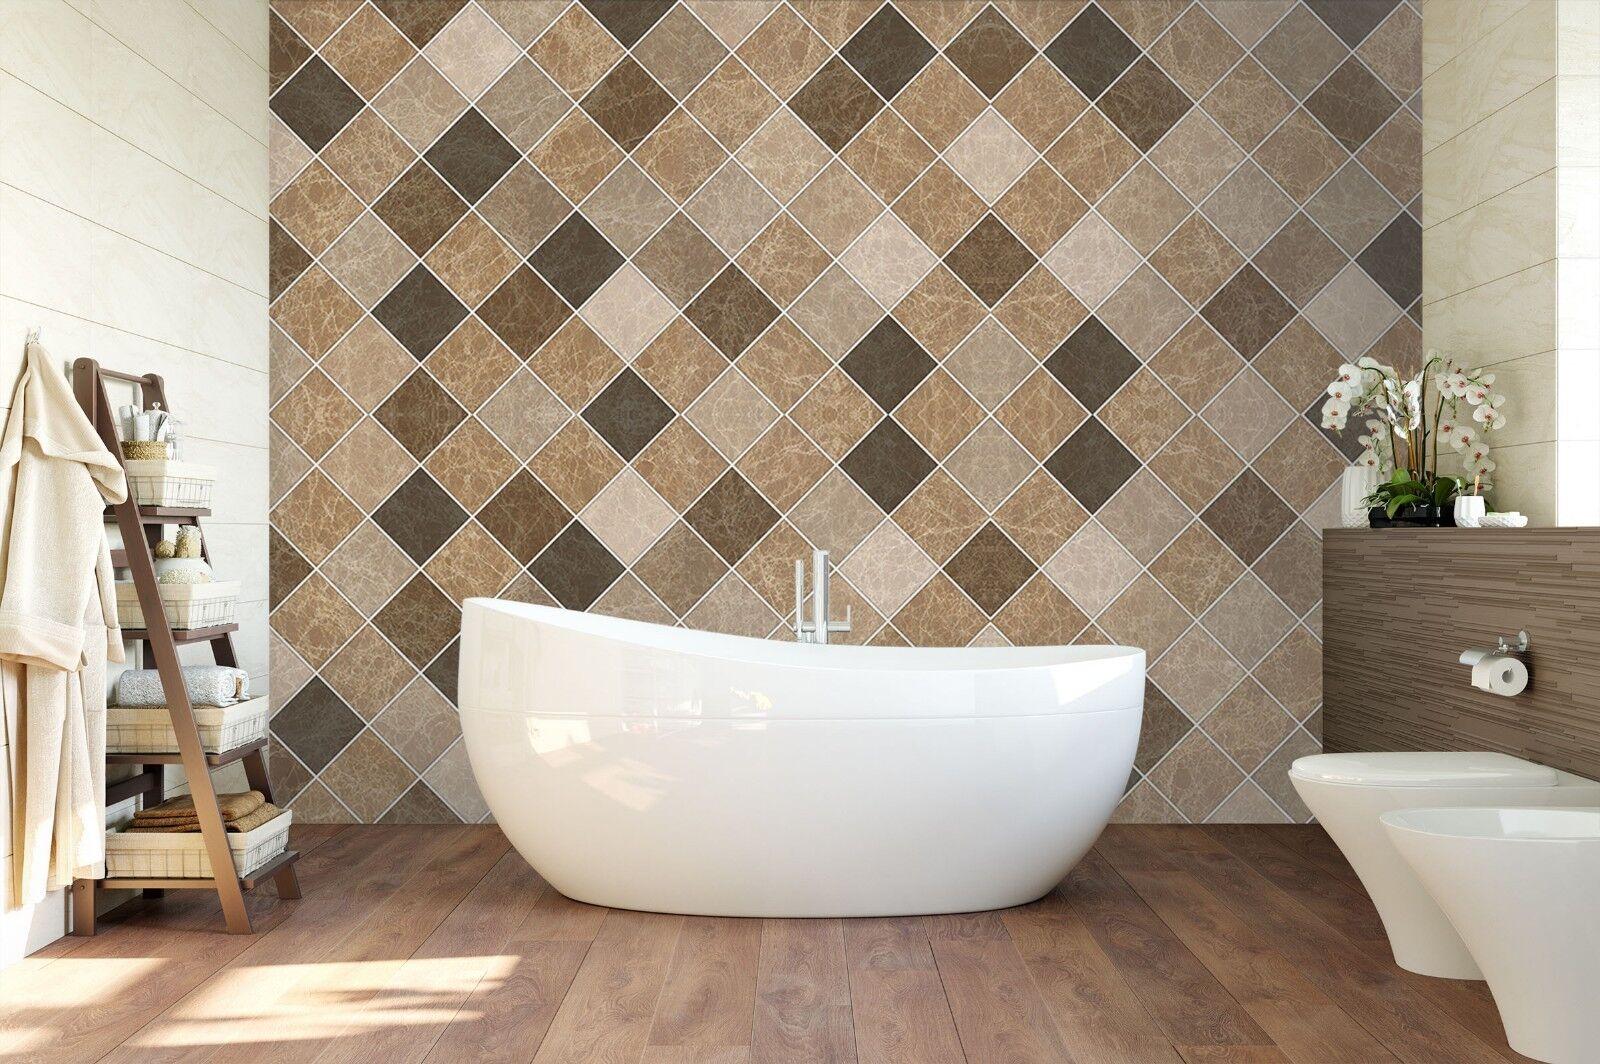 3D Bunt Mosaik 43 Textur Fliesen Marmor Tapeten Tapete Wandbild AJ